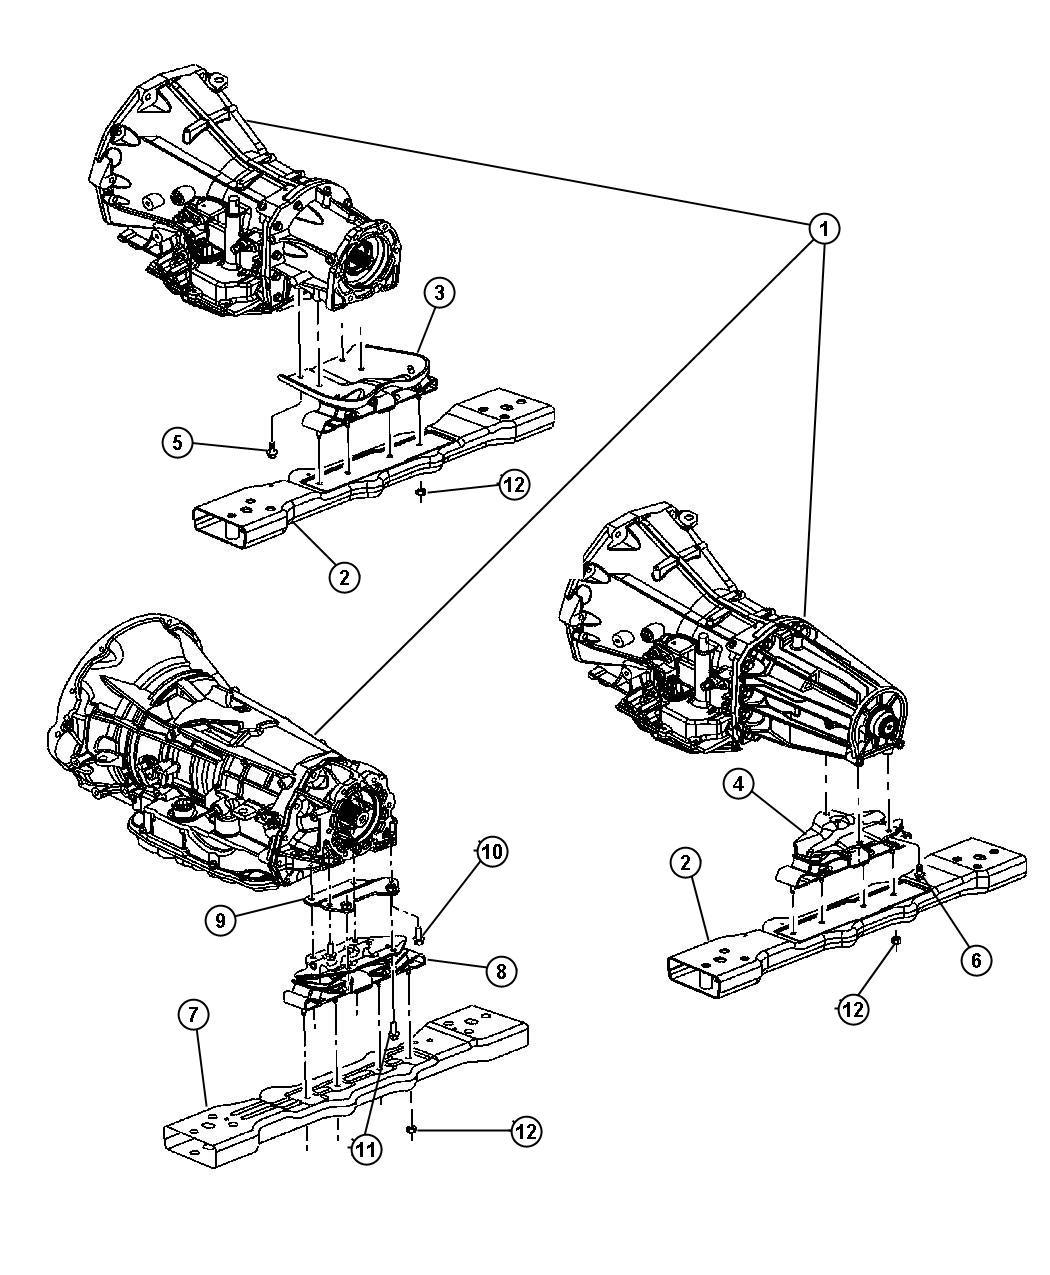 Jeep Liberty Mount Transmission